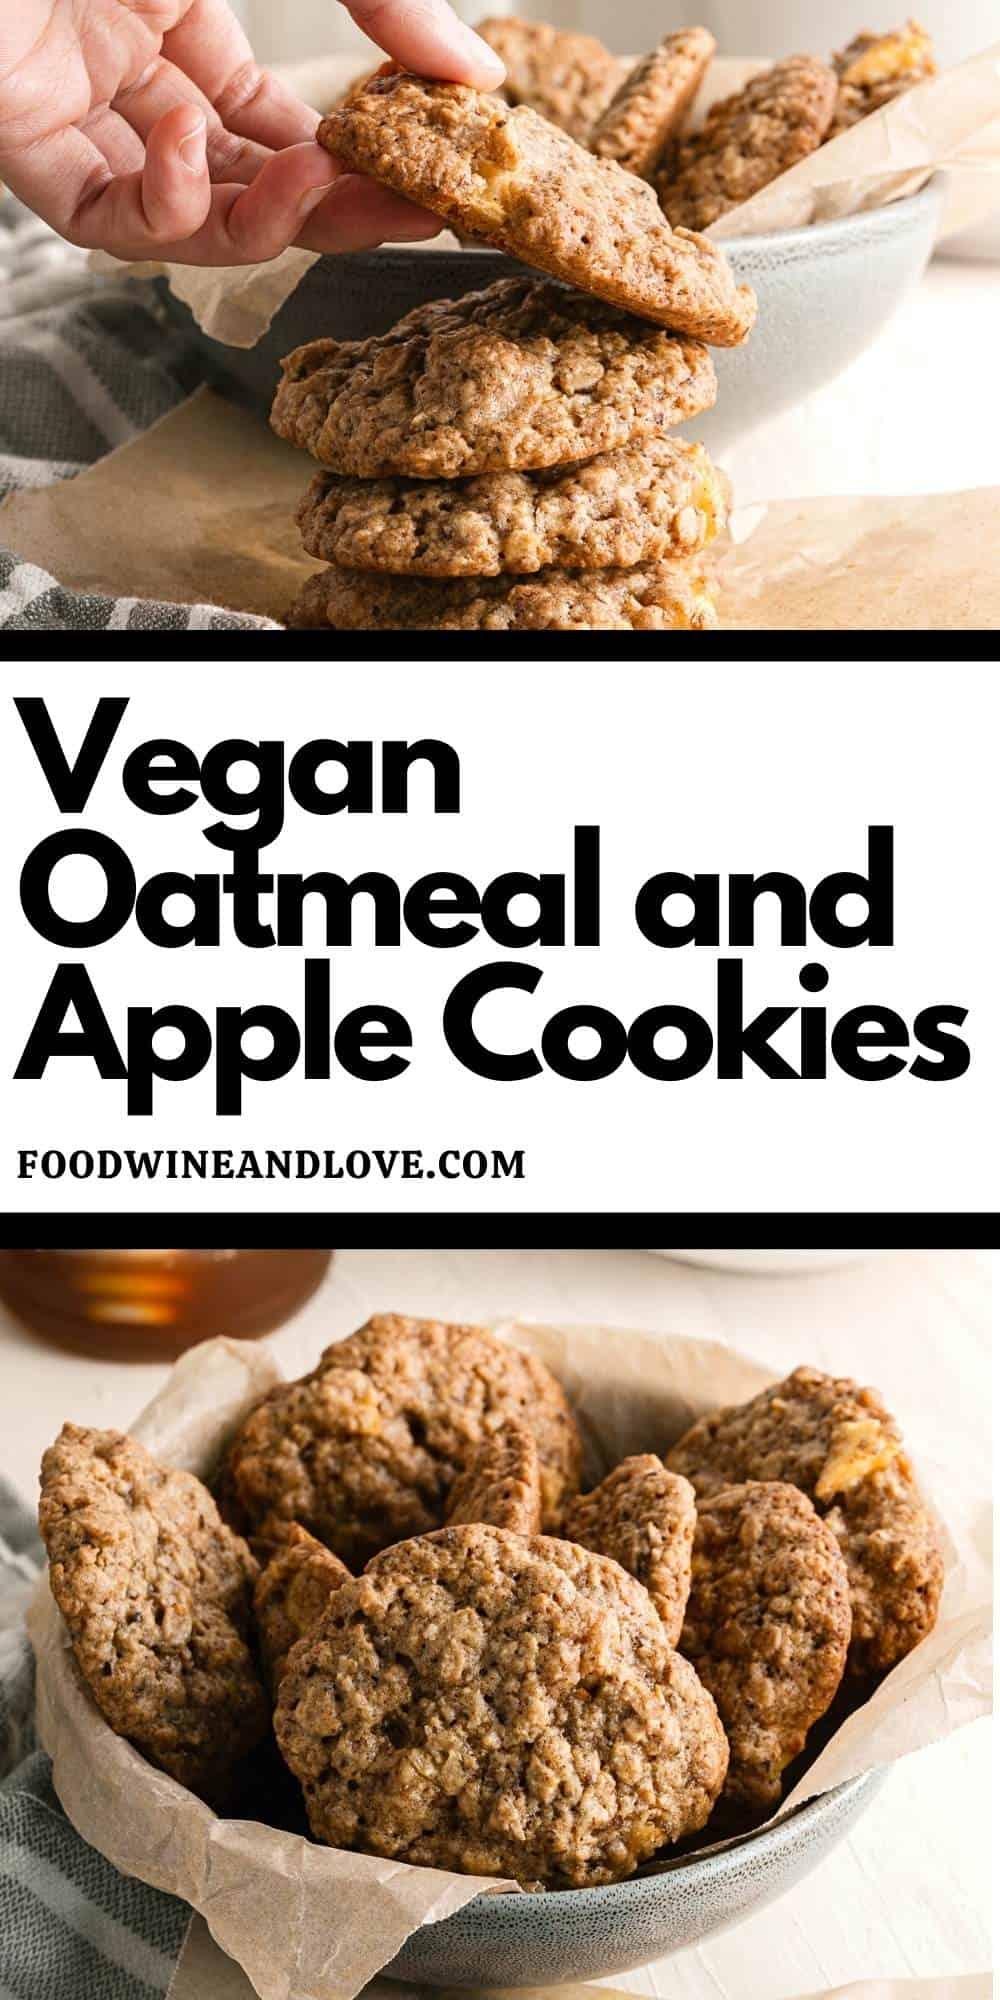 Vegan Oatmeal and Apple Cookies